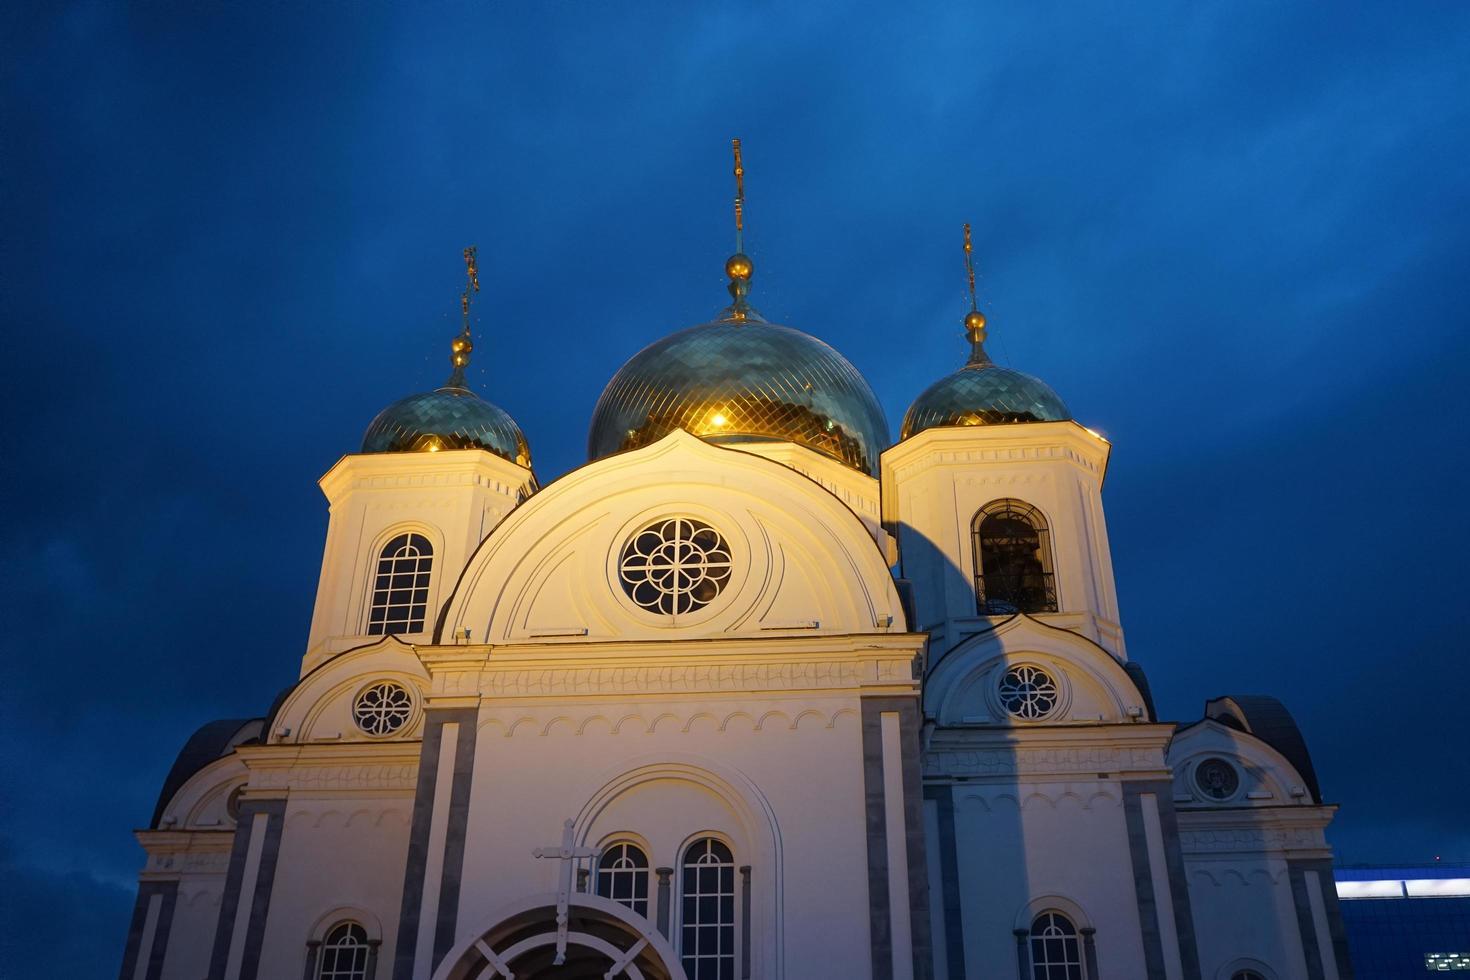 iglesia cristiana contra el cielo de la tarde. krasnodar foto